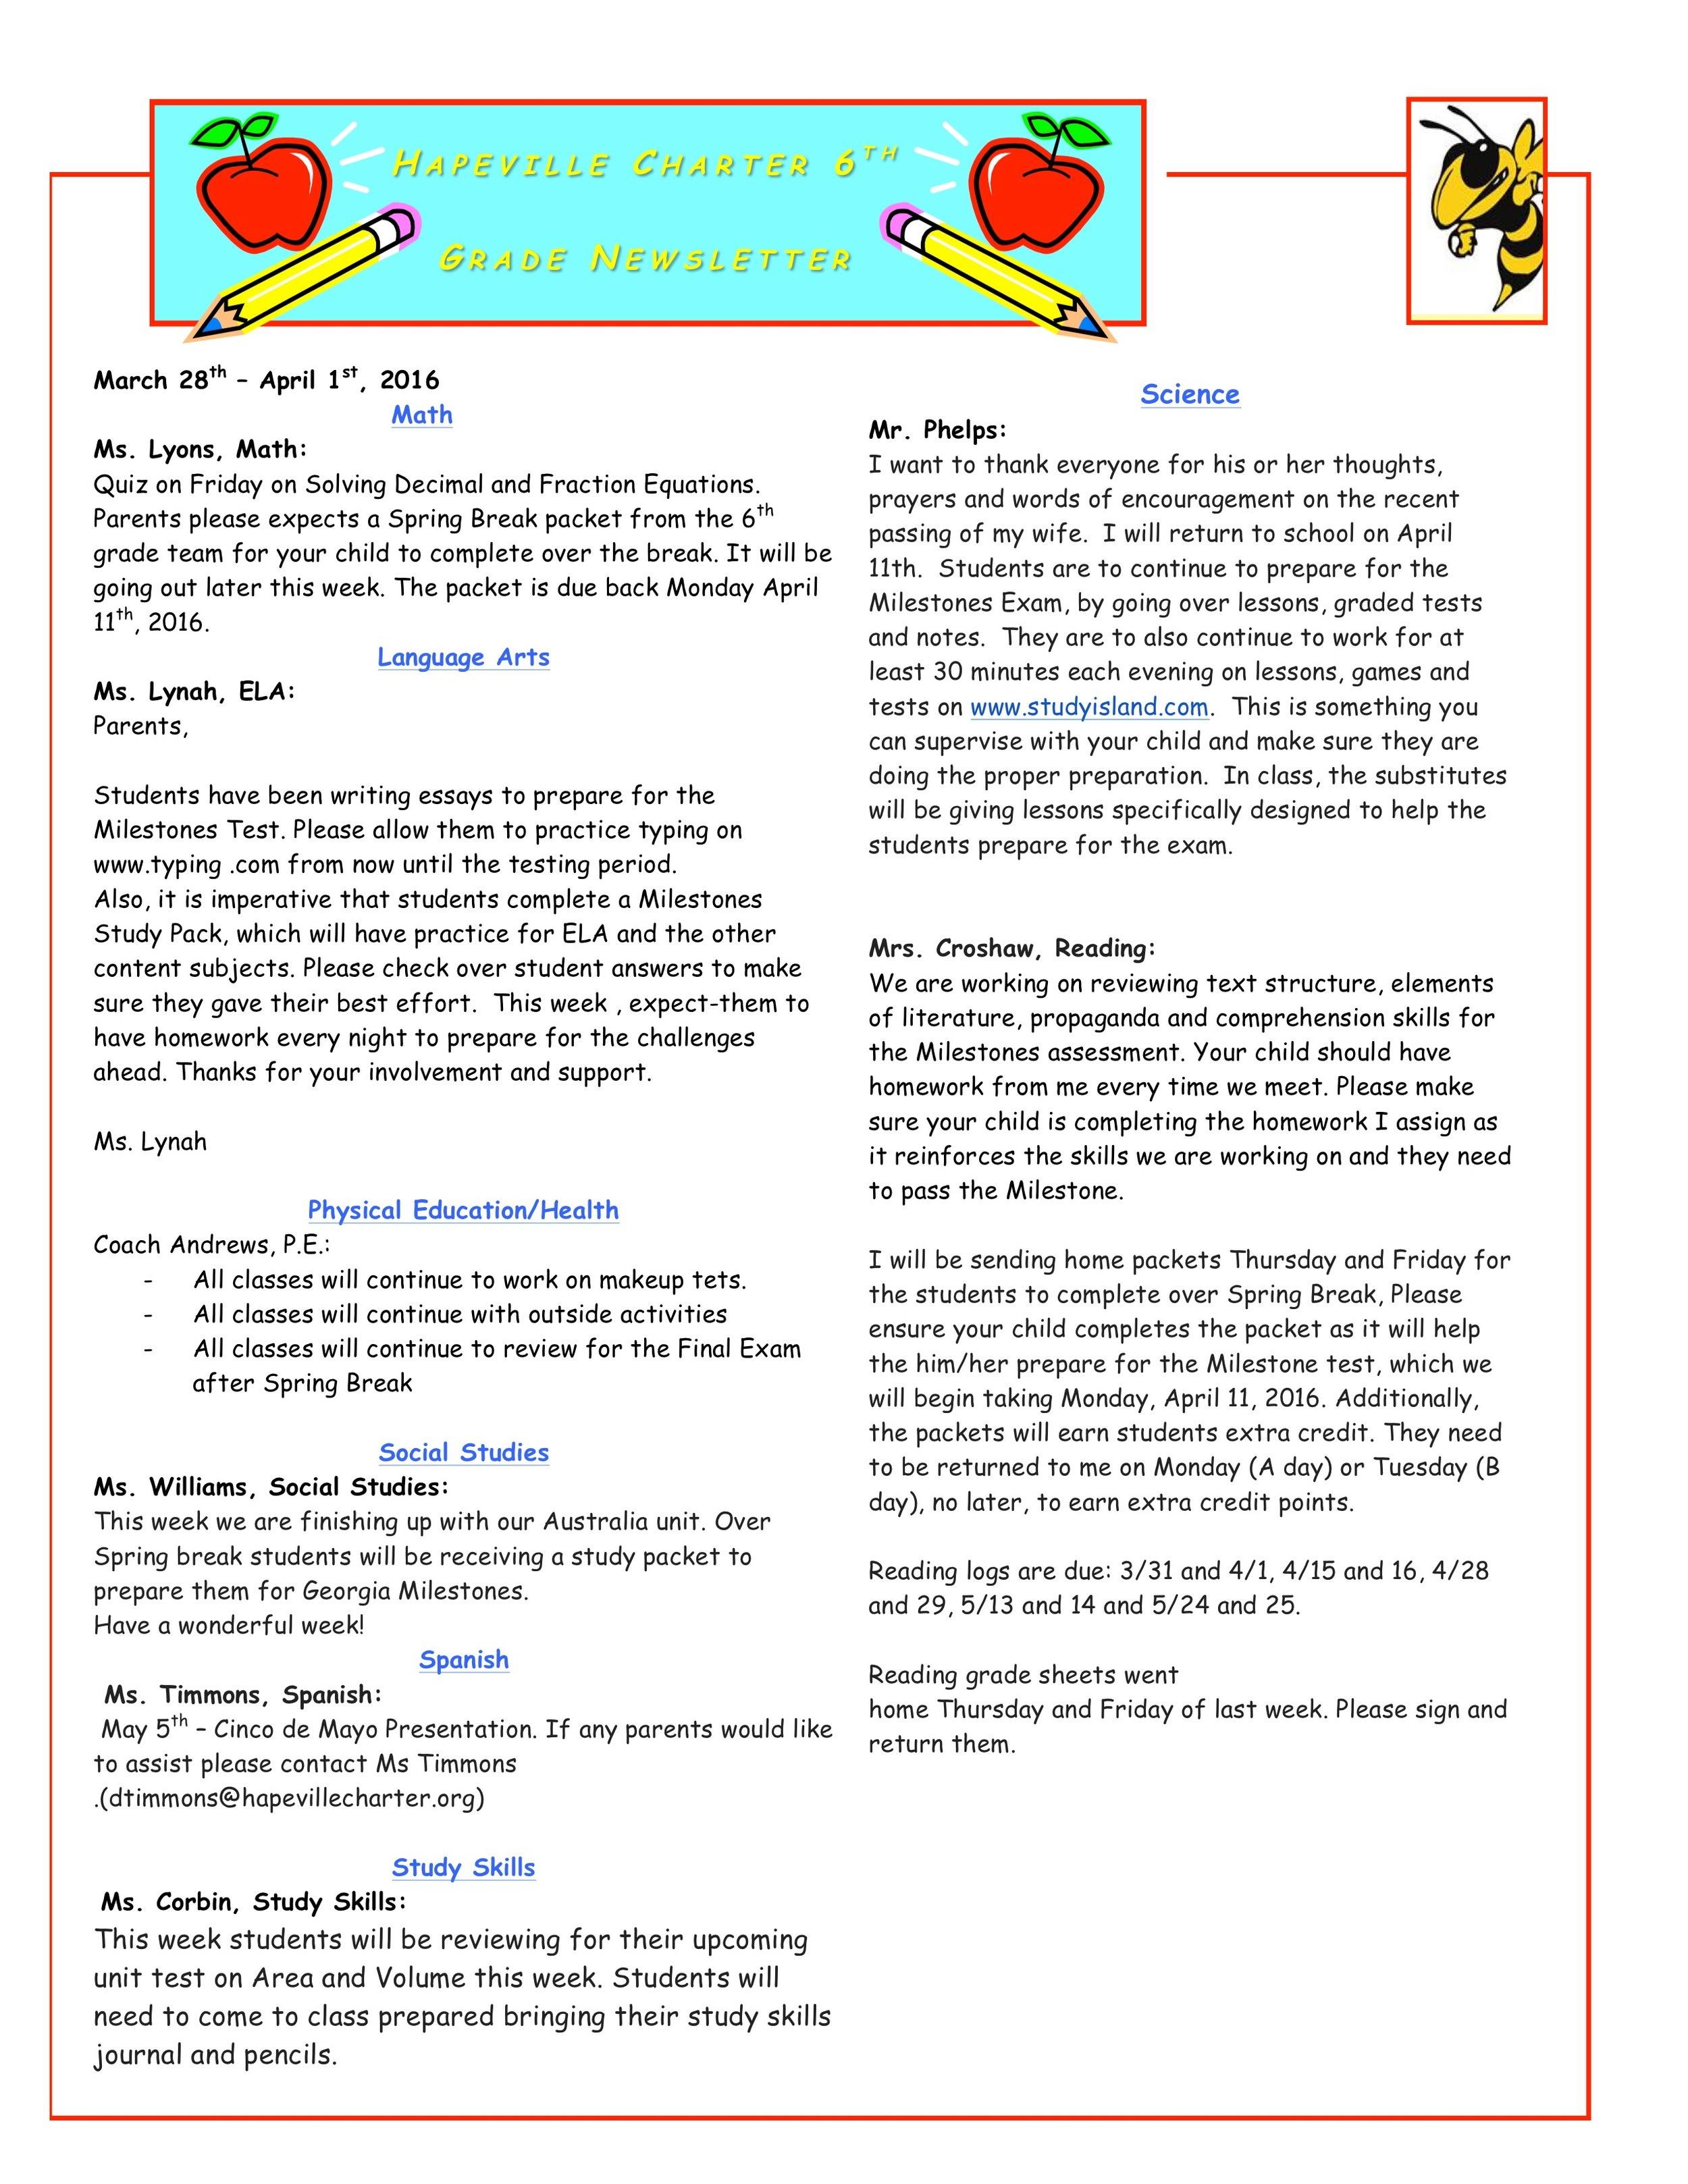 Newsletter Image6th Grade 3-28-2016.jpeg